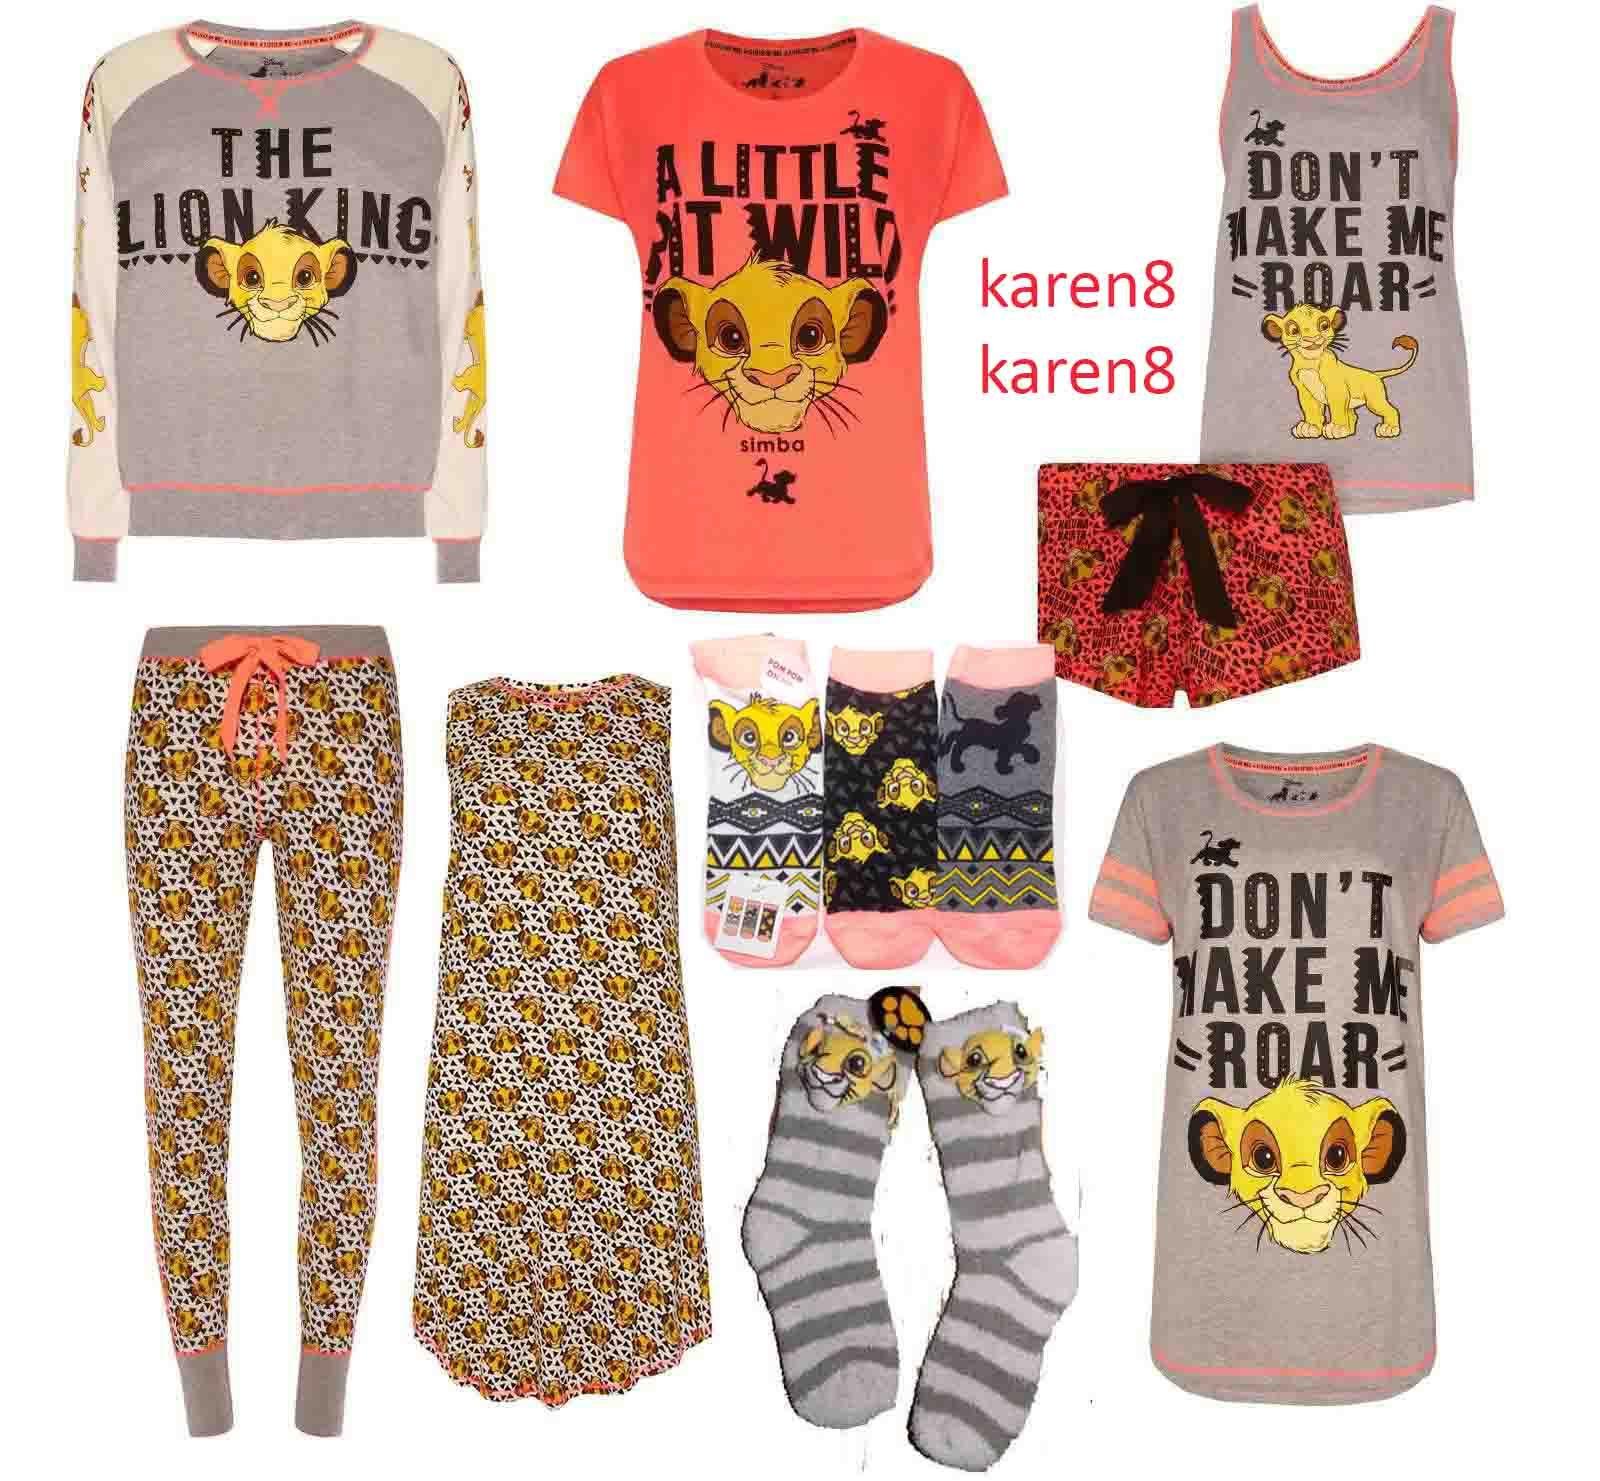 Lion King Simba Nala pajamas pj s socks and joggers and tanks clothing  women s fashion you can buy at my ebay store karen8karen8 44272785f1